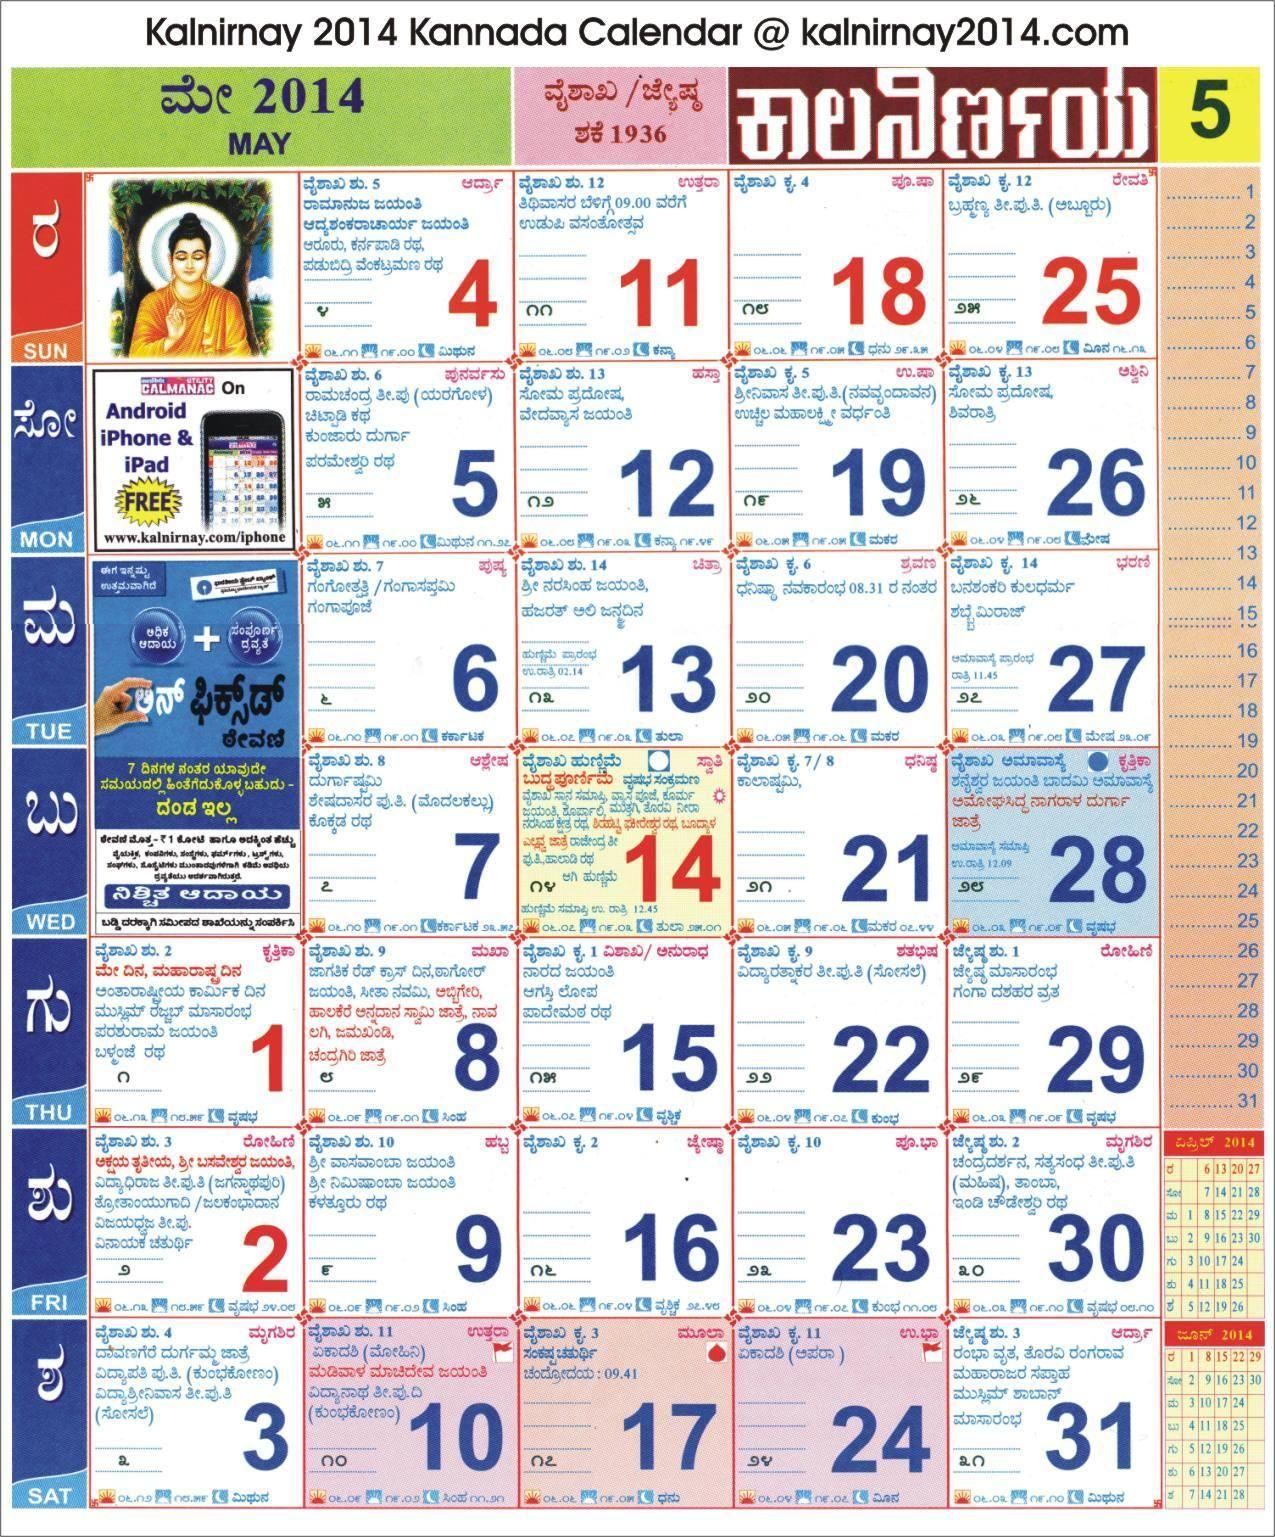 April Calendar Kannada : May kannada kalnirnay calendar